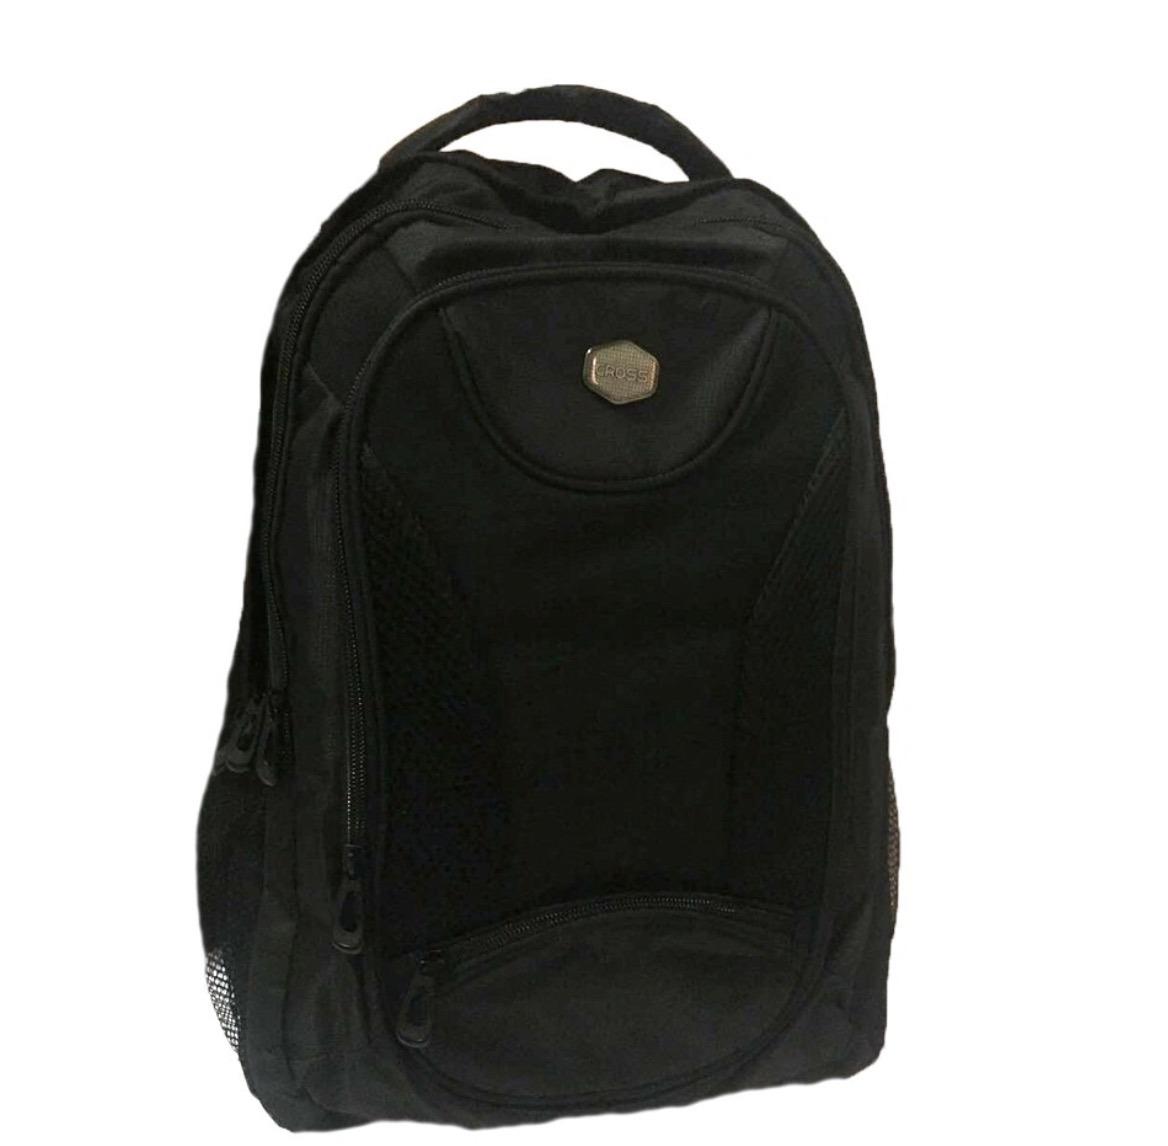 28268c570 mochila juvenil masculina clio style cross escolar linda. Carregando zoom.